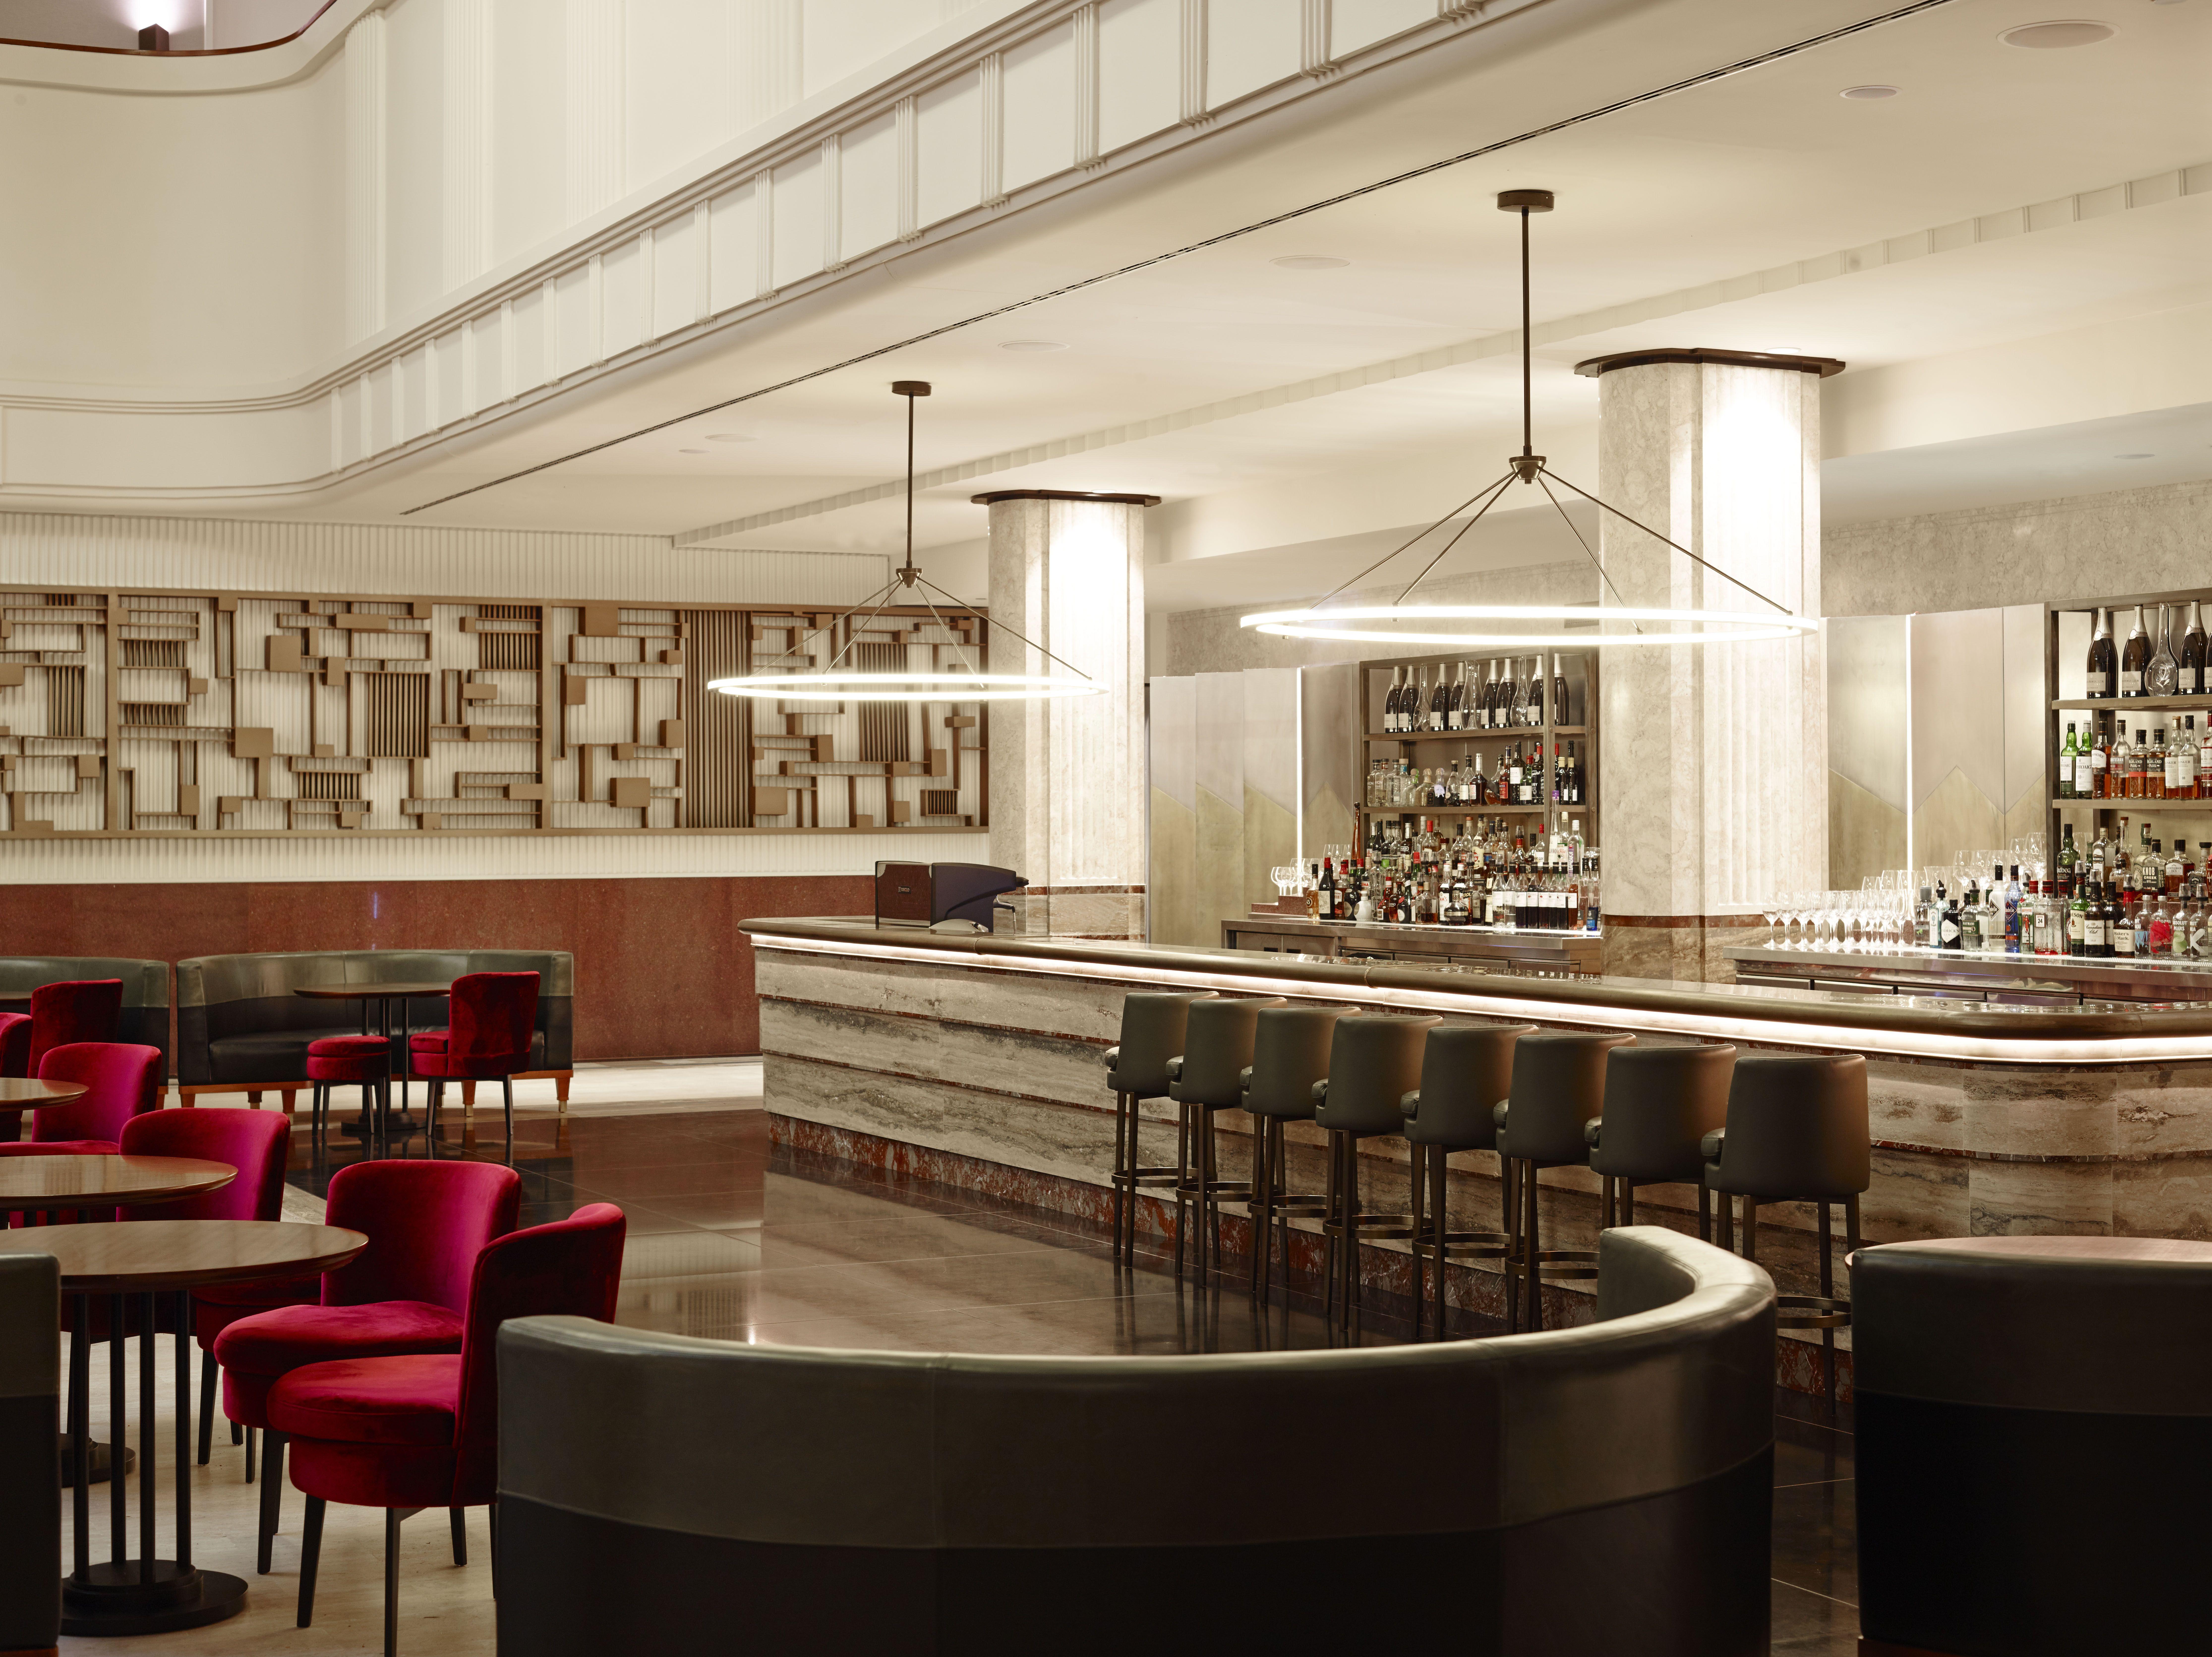 Art deco gem revealed for Sydney public as luxury Primus Hotel | AIA ...